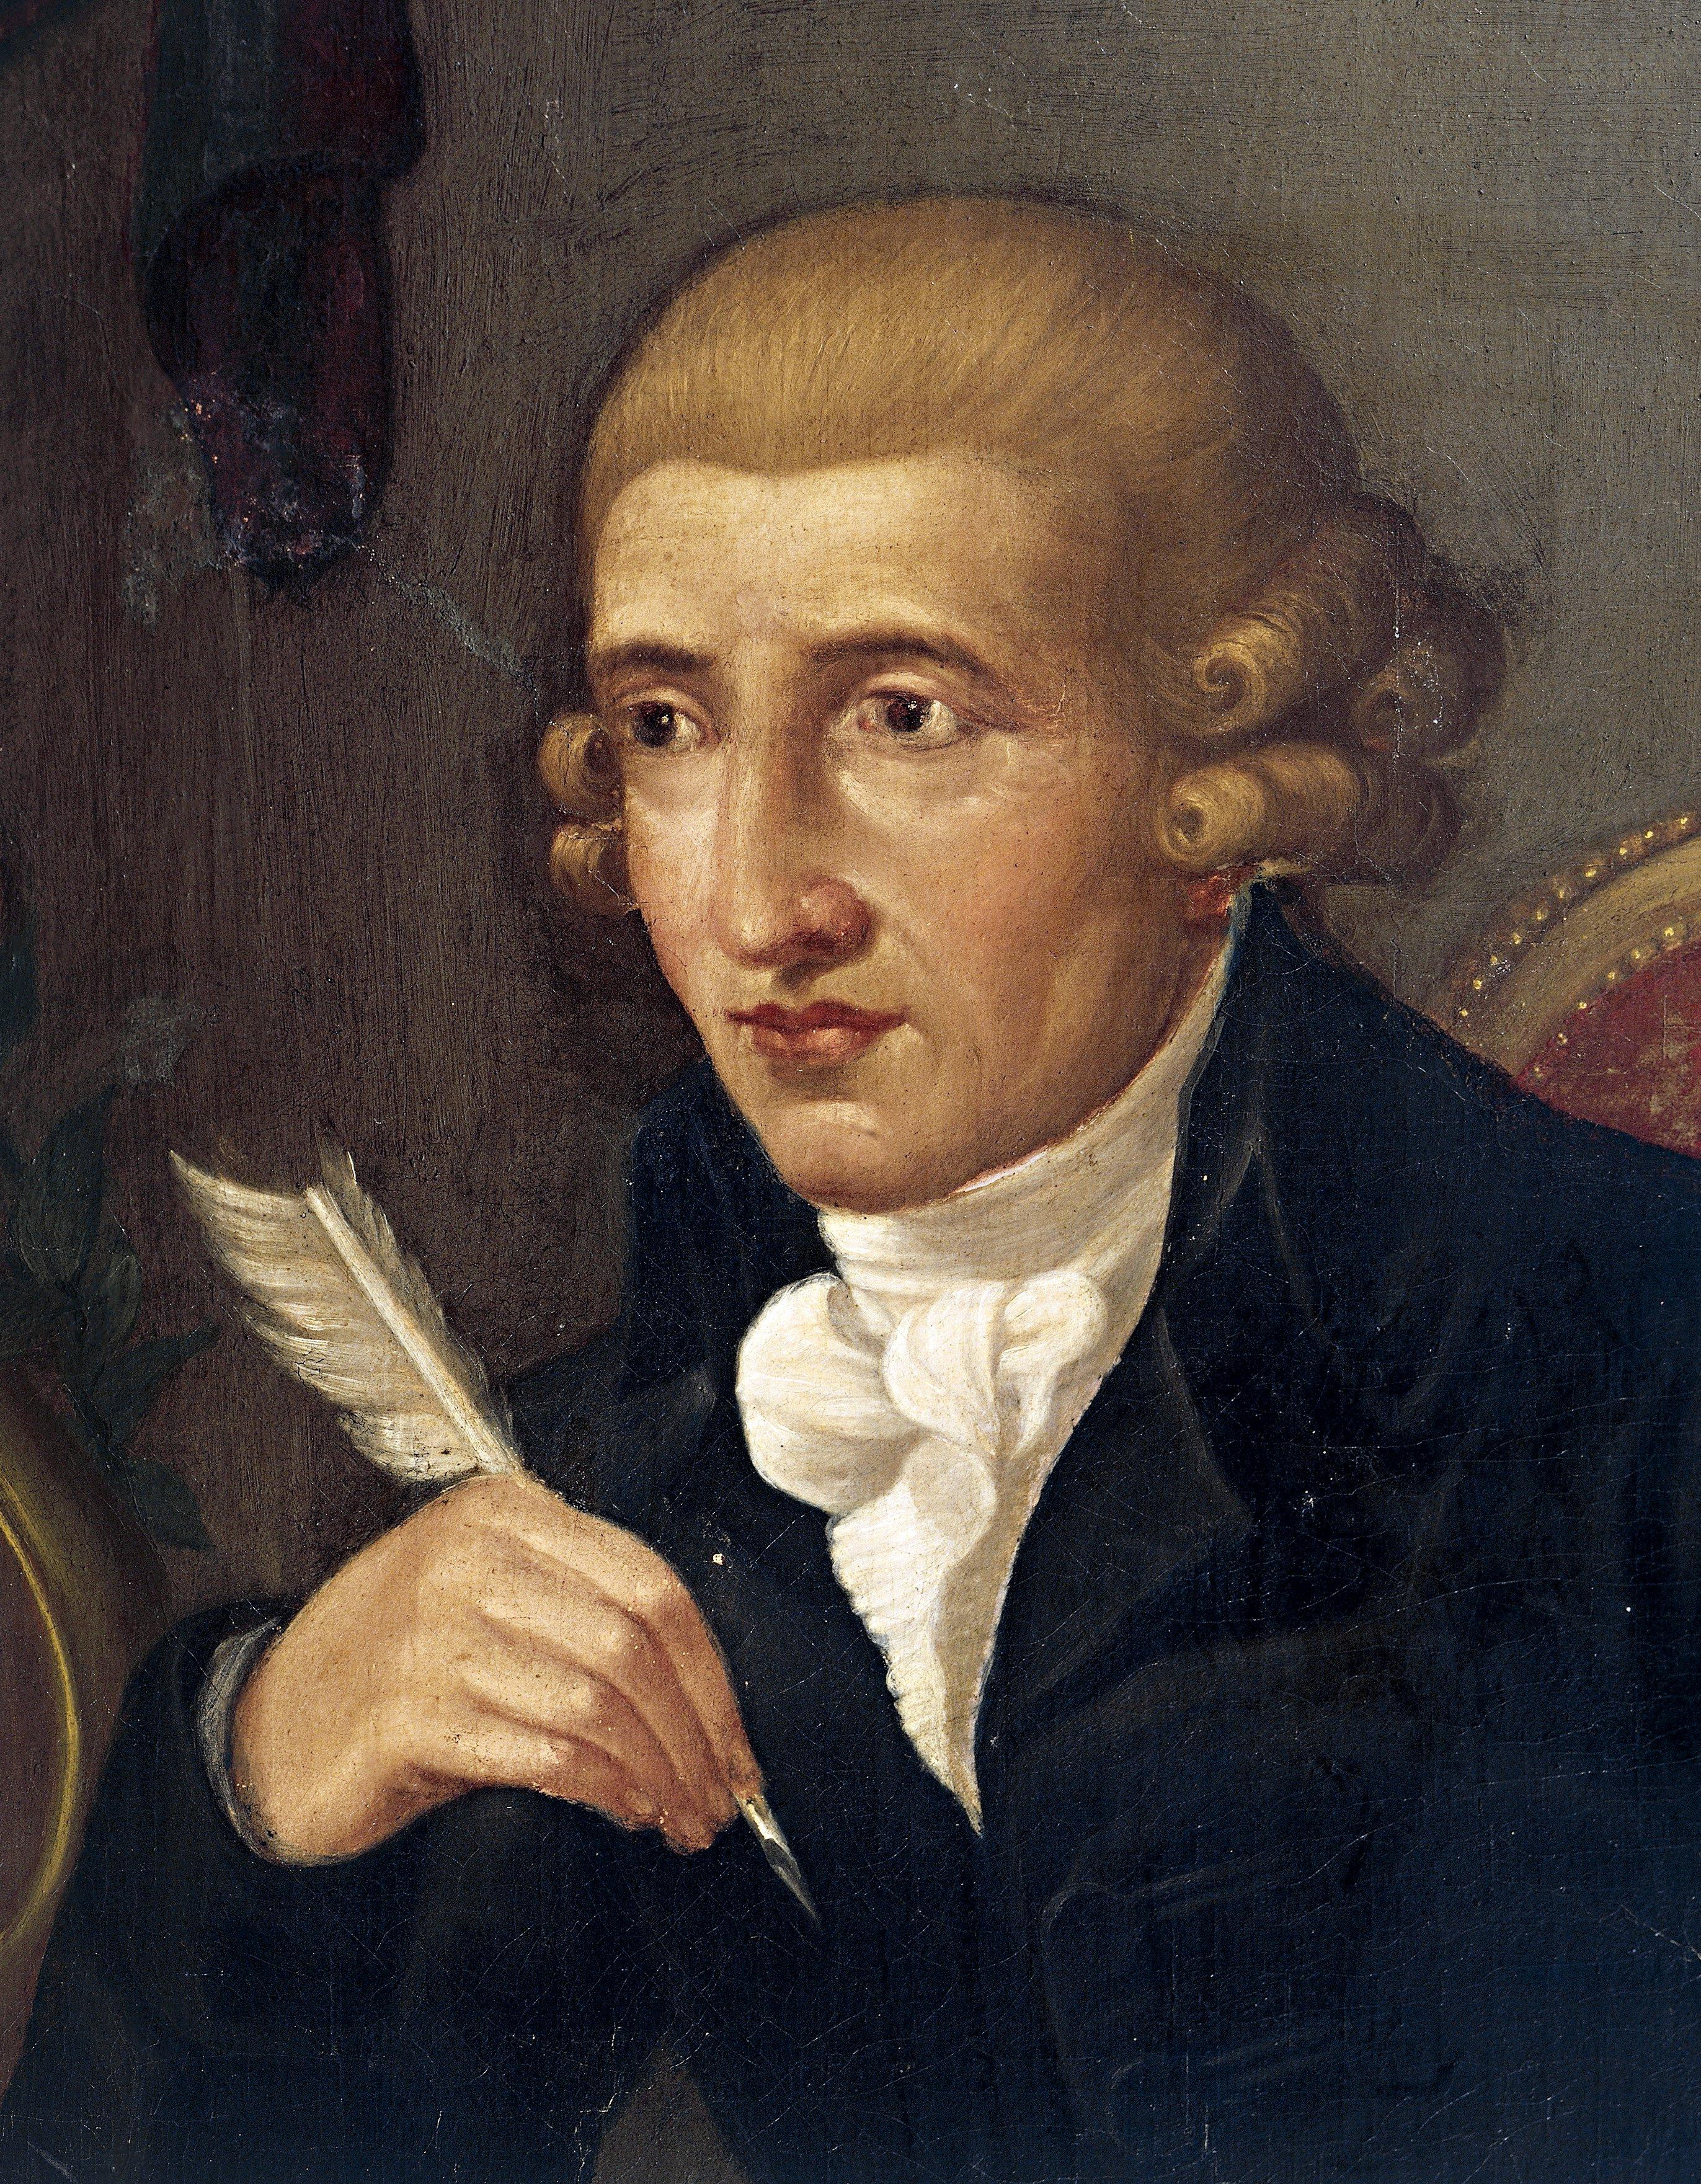 Joseph Haydn composed the German national anthem